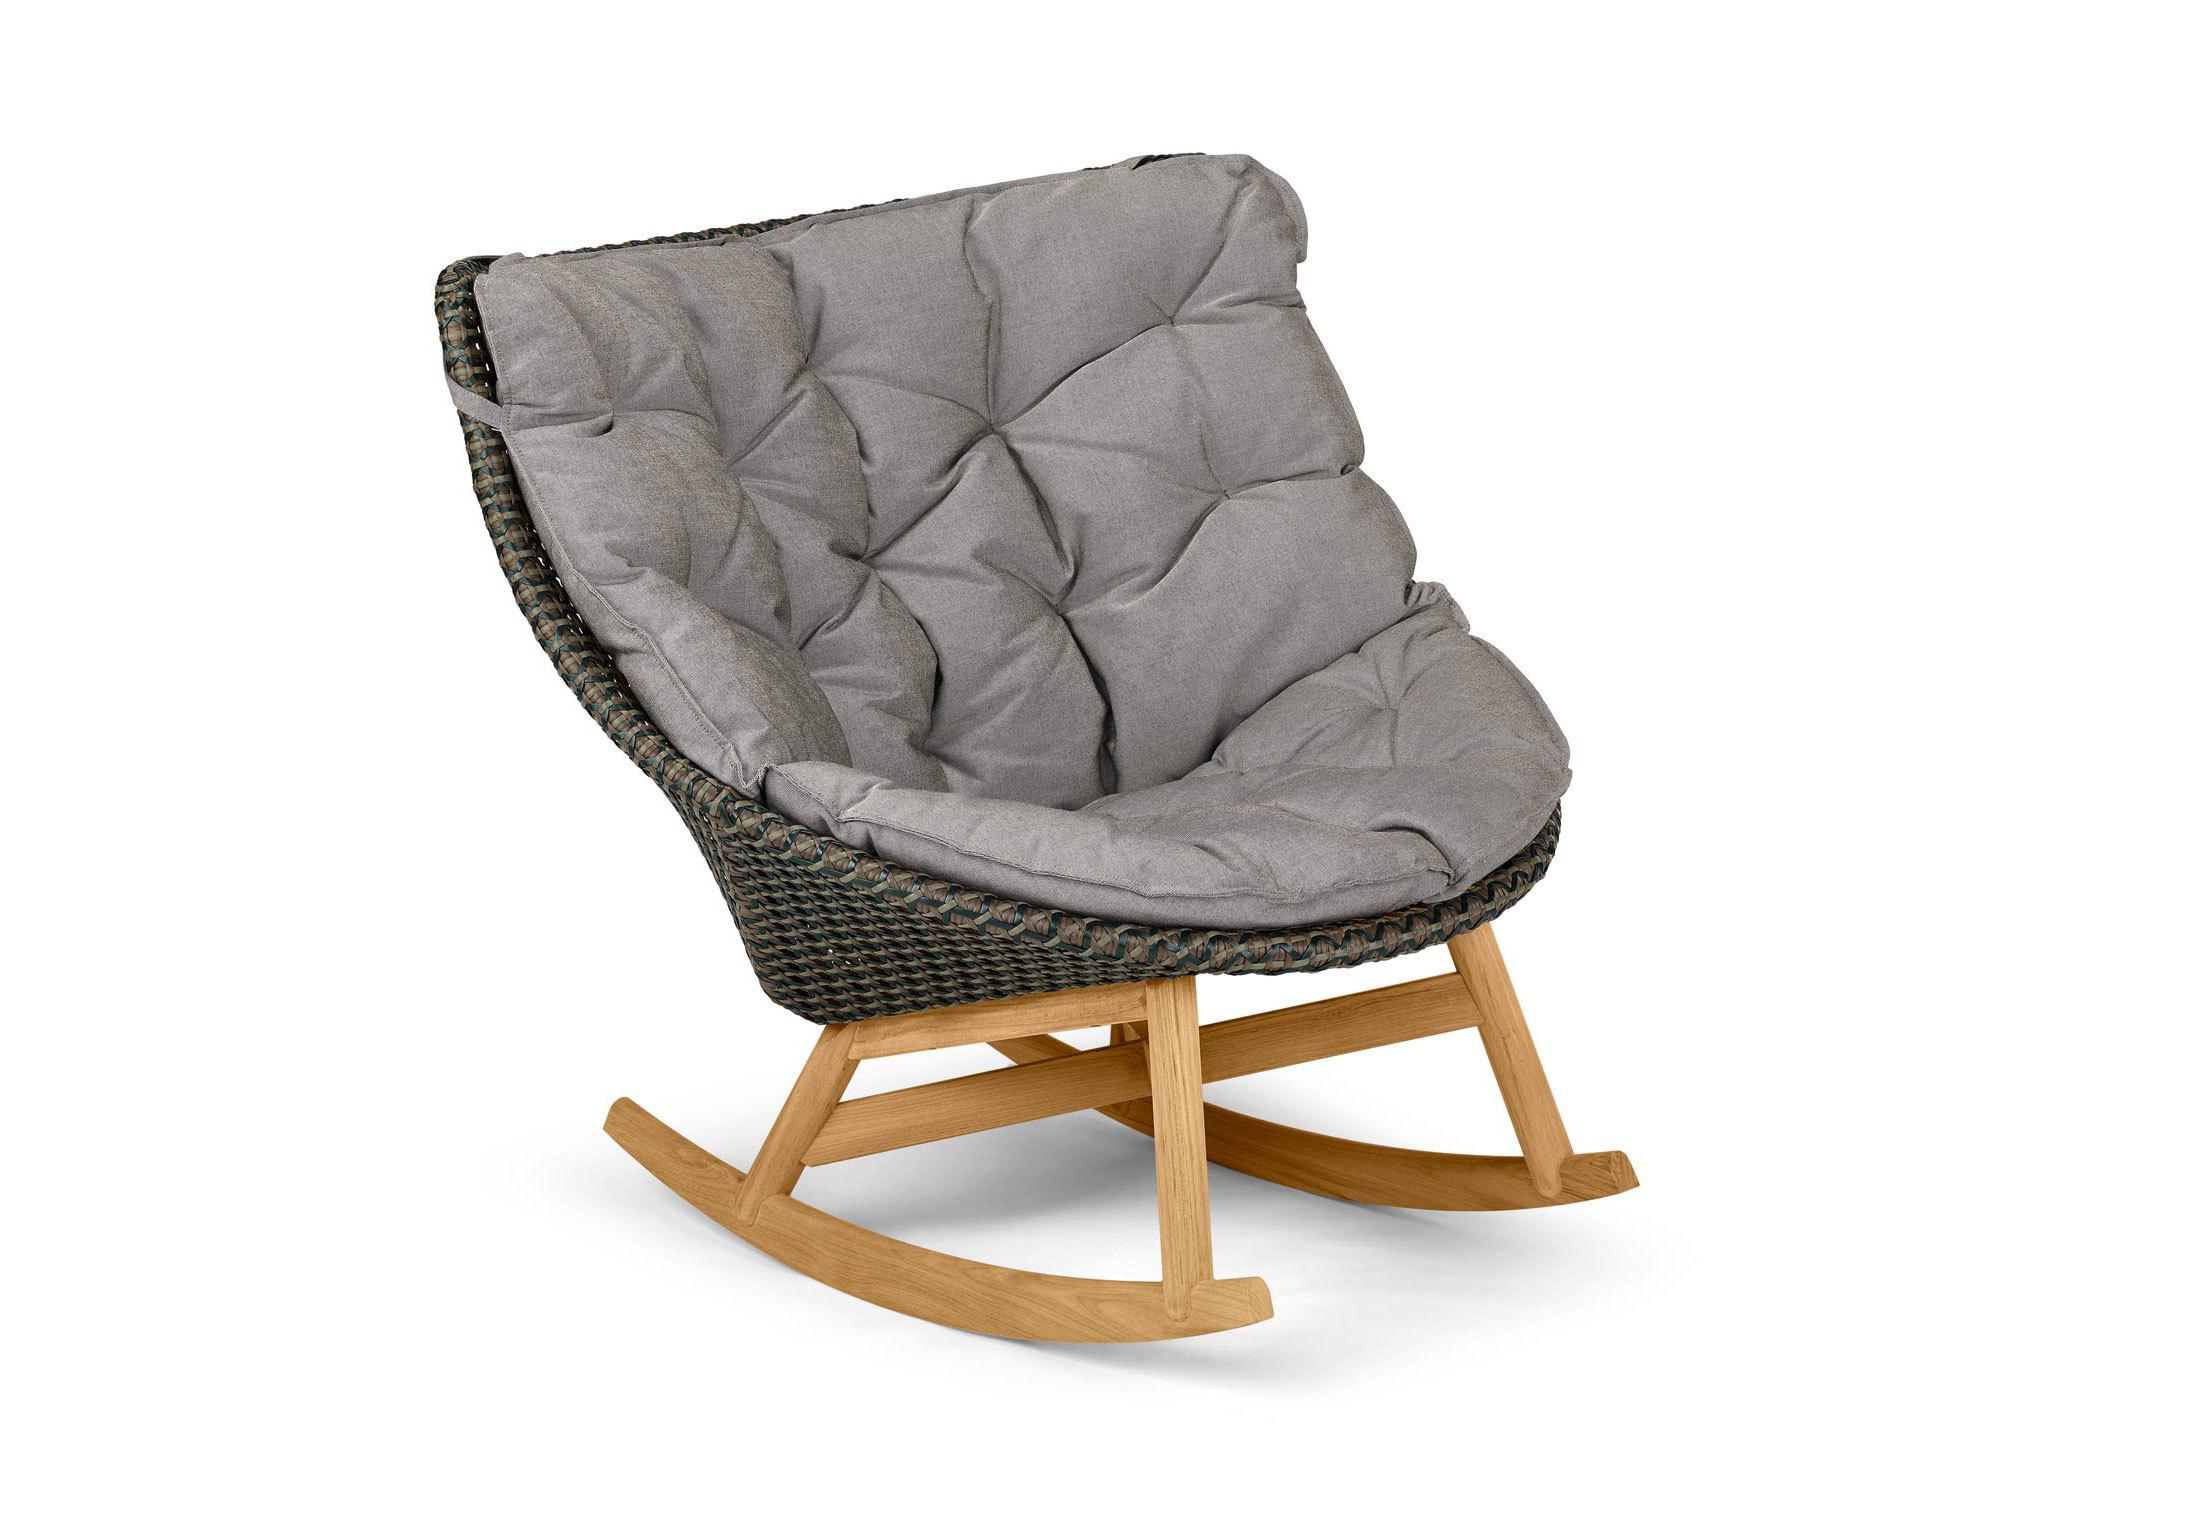 MBRACE Rocking Chair · MBRACE Rocking Chair ...